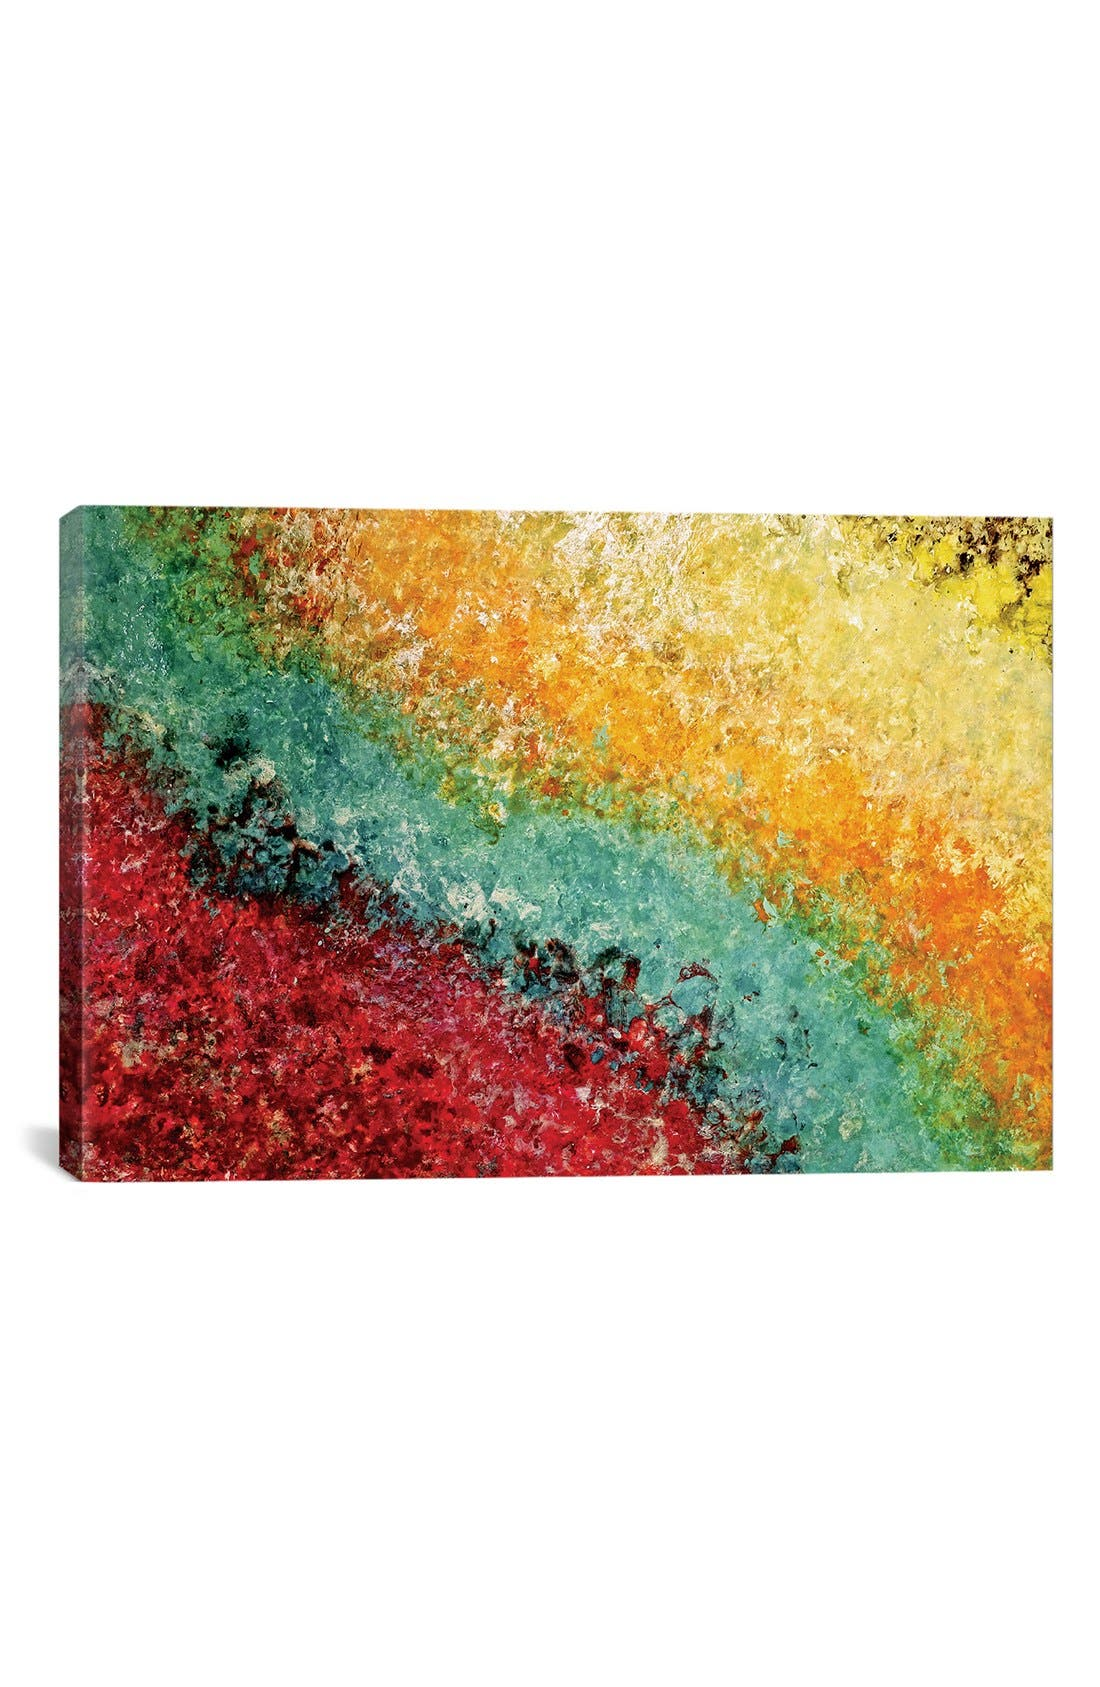 'Enchanted Lullaby' Giclée Print Canvas Art,                             Main thumbnail 1, color,                             700